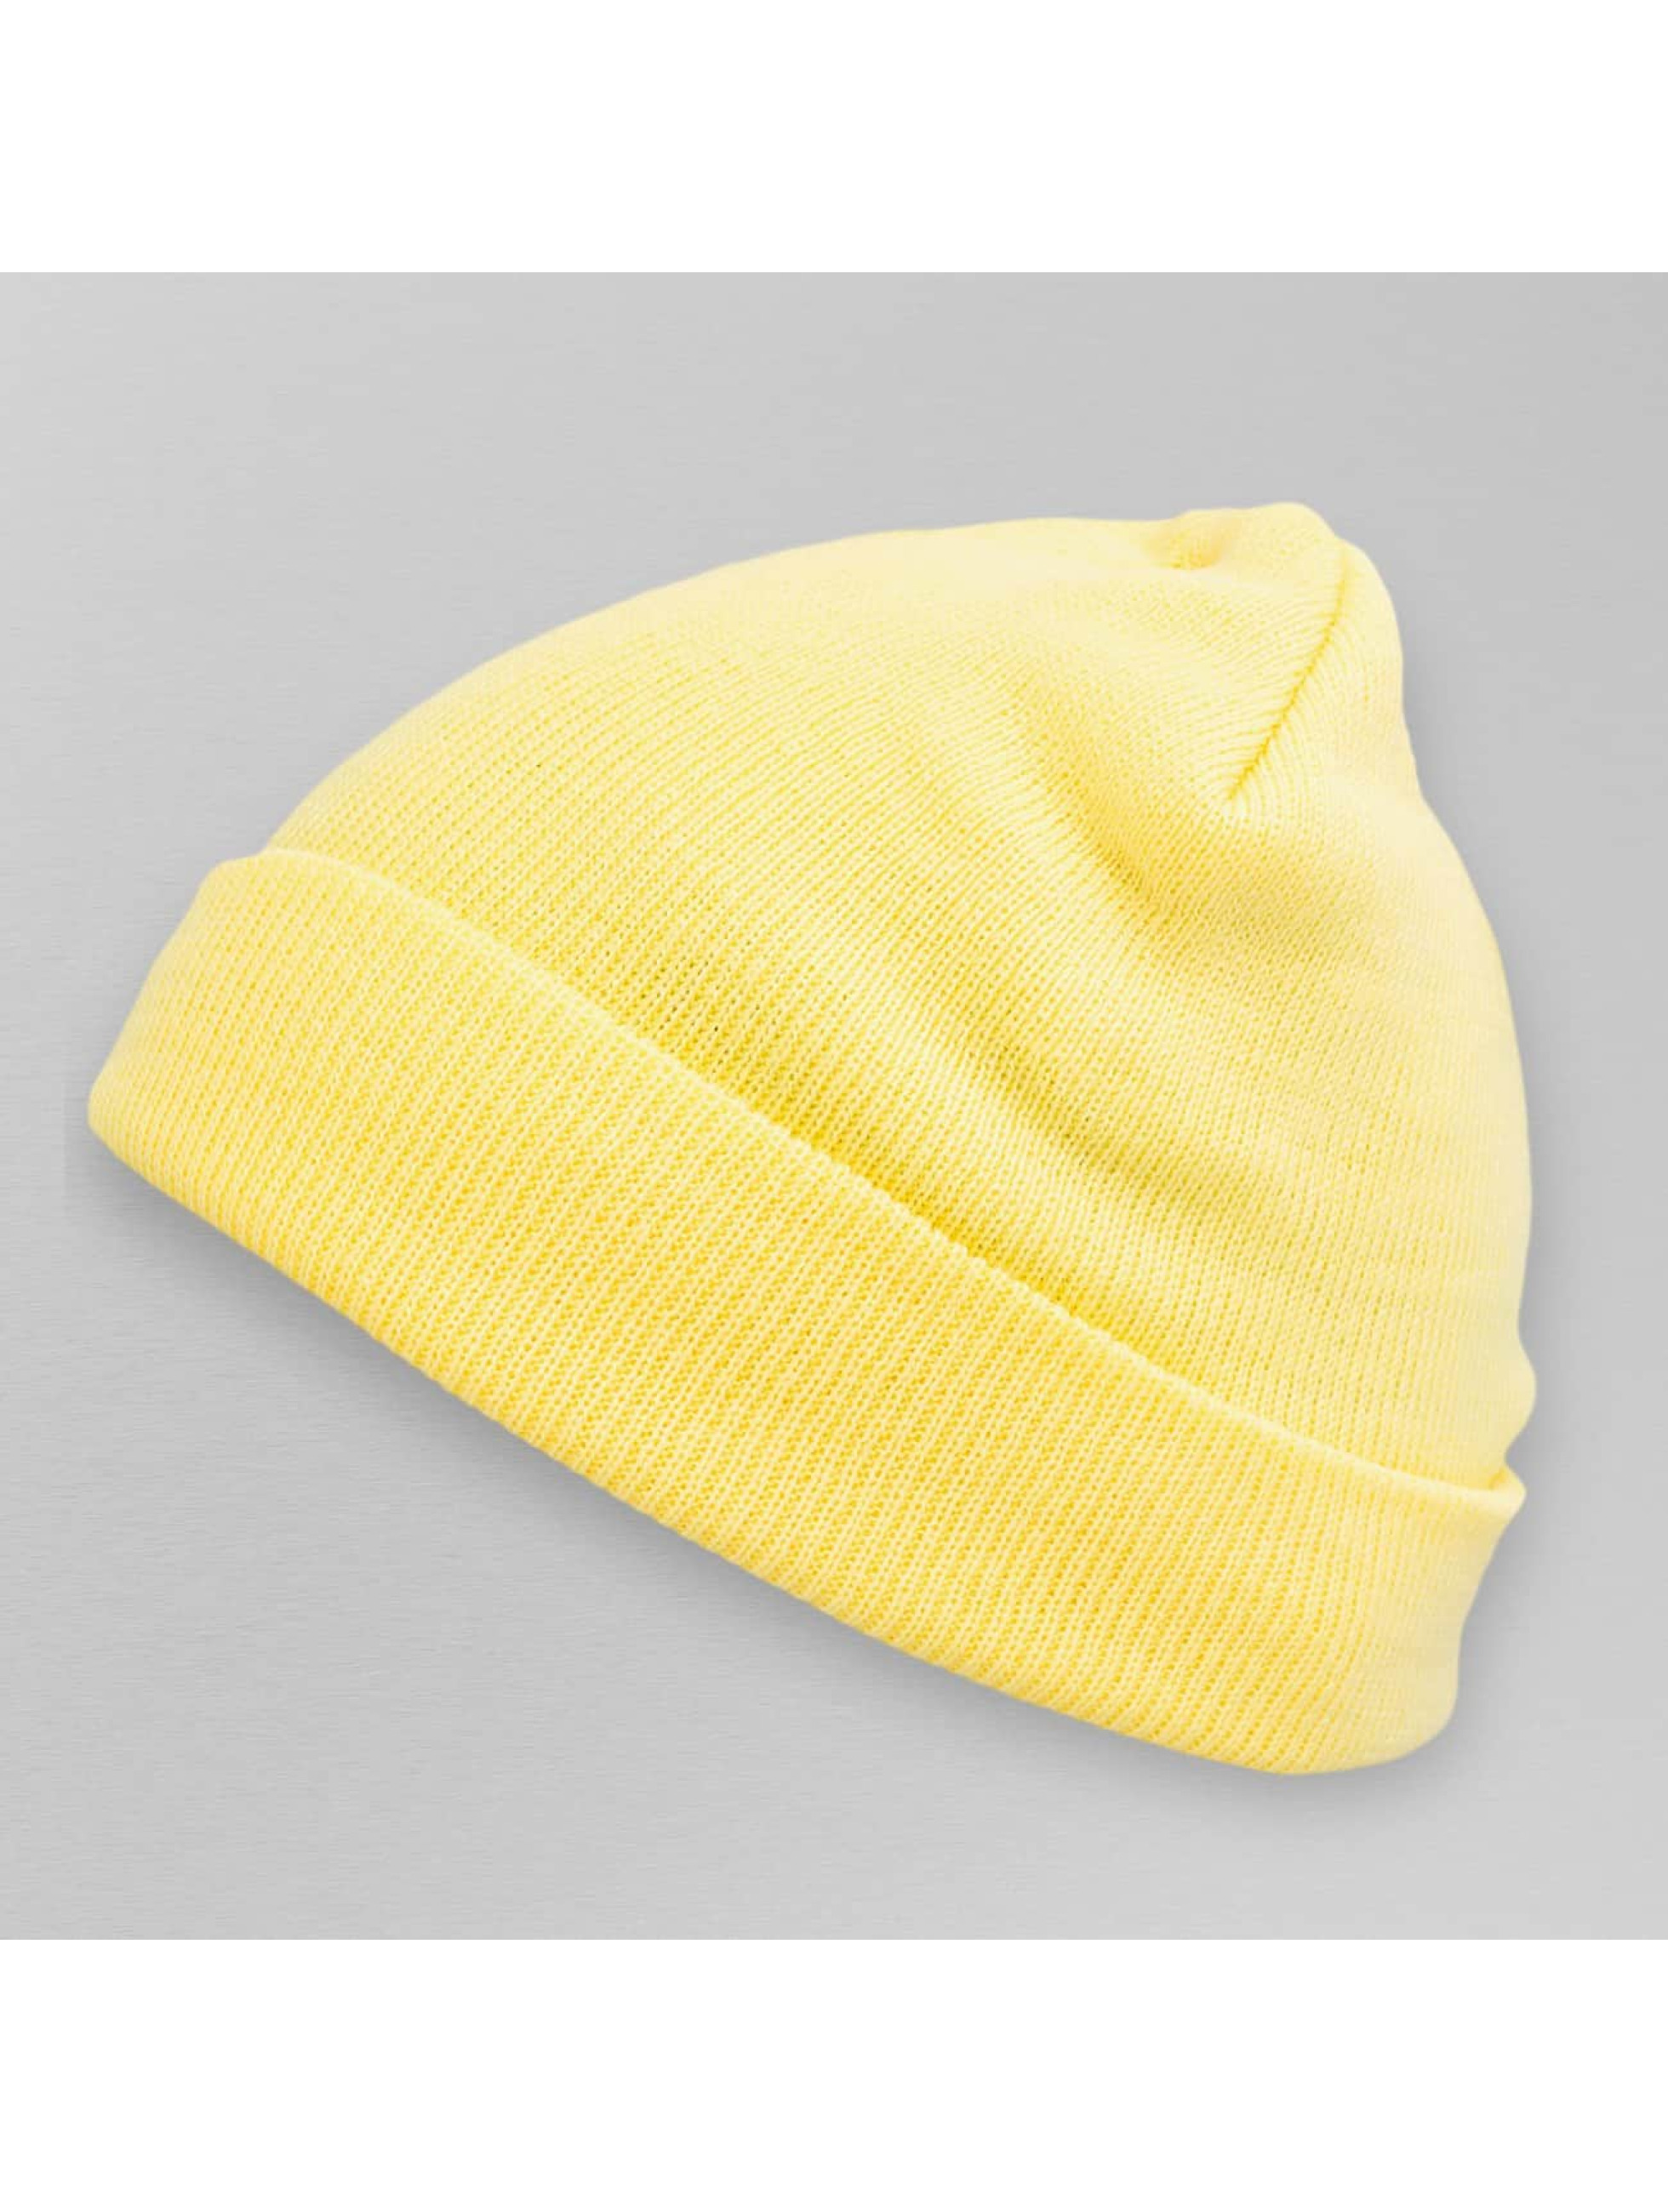 MSTRDS шляпа Pastel Basic Flap желтый